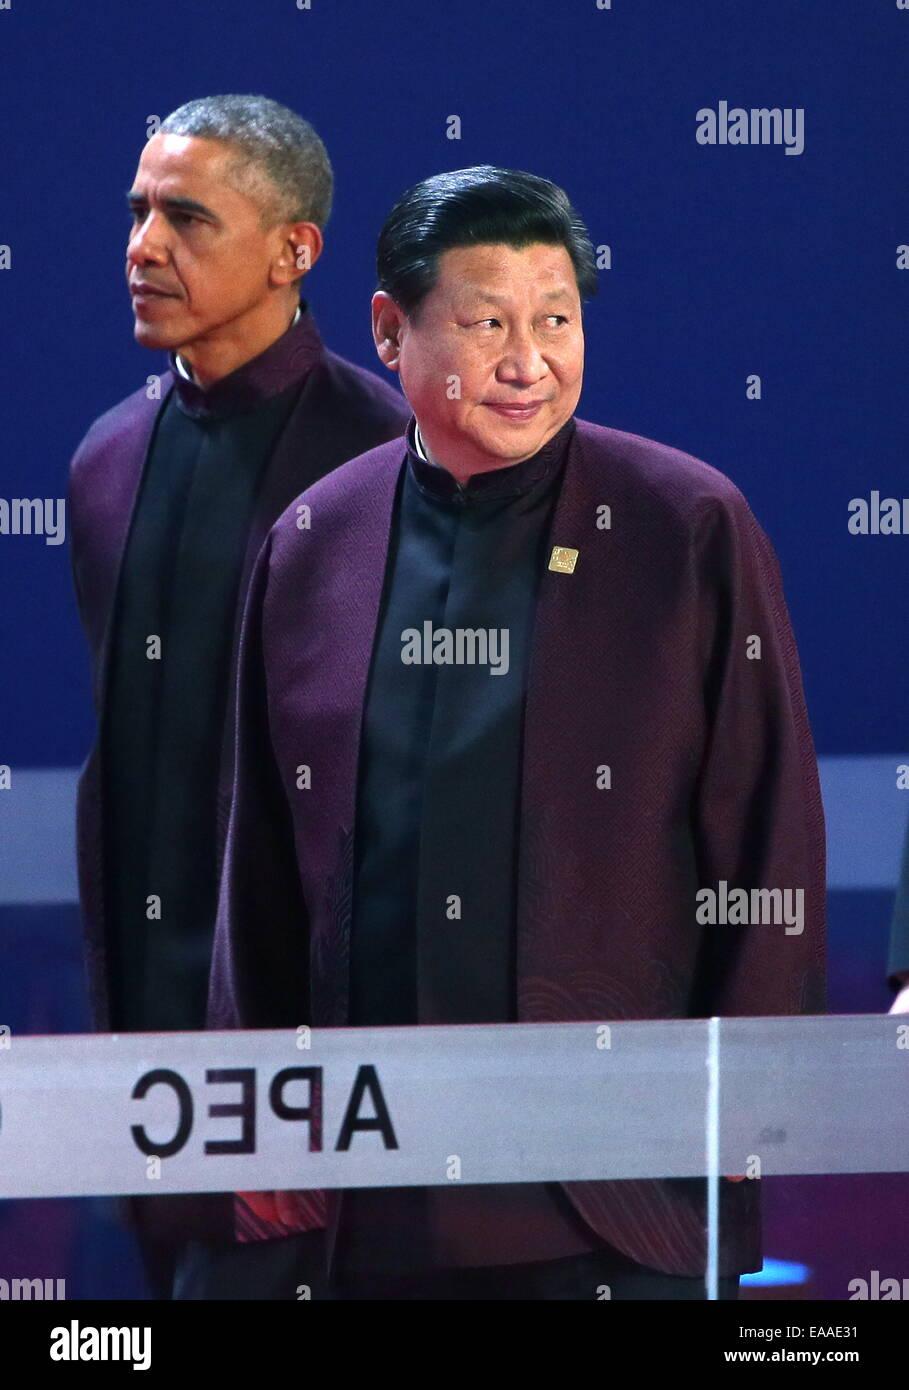 Beijing, China. 10th Nov, 2014. U.S. president Barack Obama (L) and China's president Xi Jinping seen ahead - Stock Image